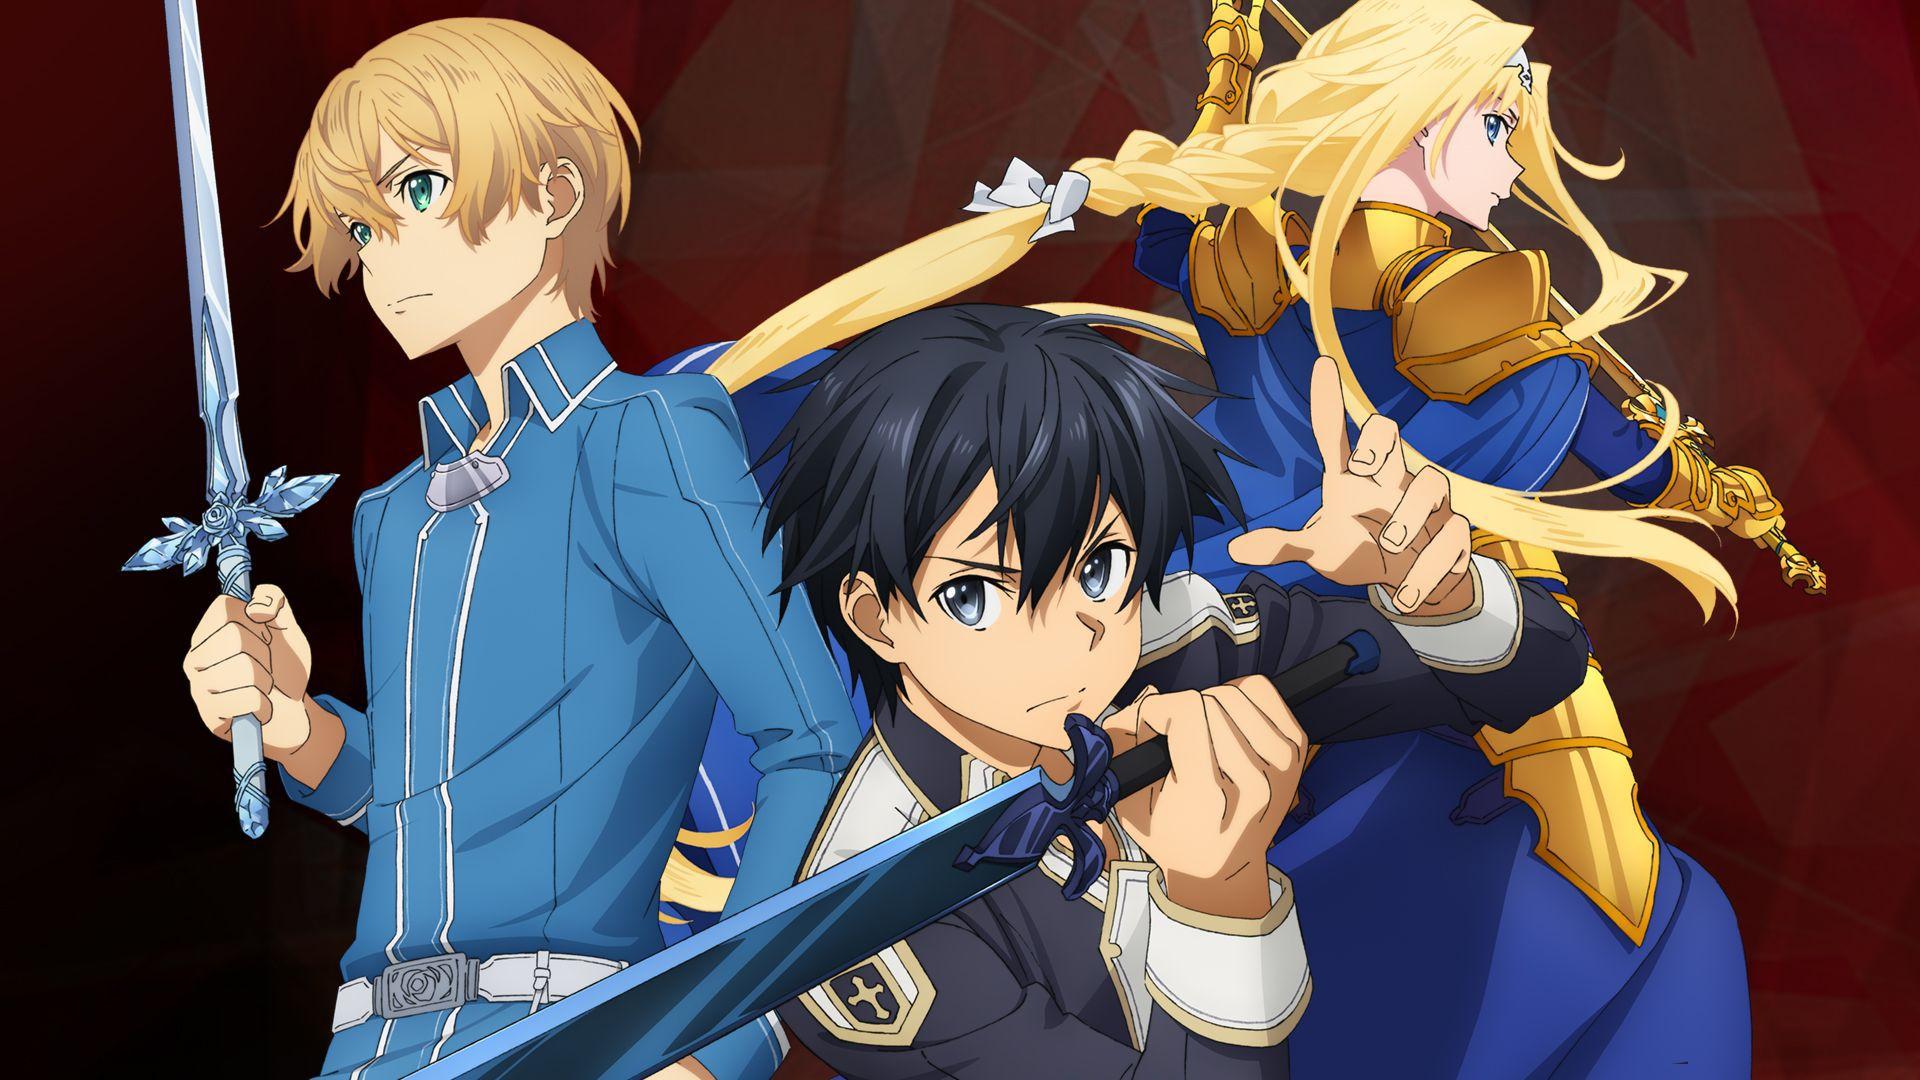 Sword Art Online: Alicization verrà presentato in ...